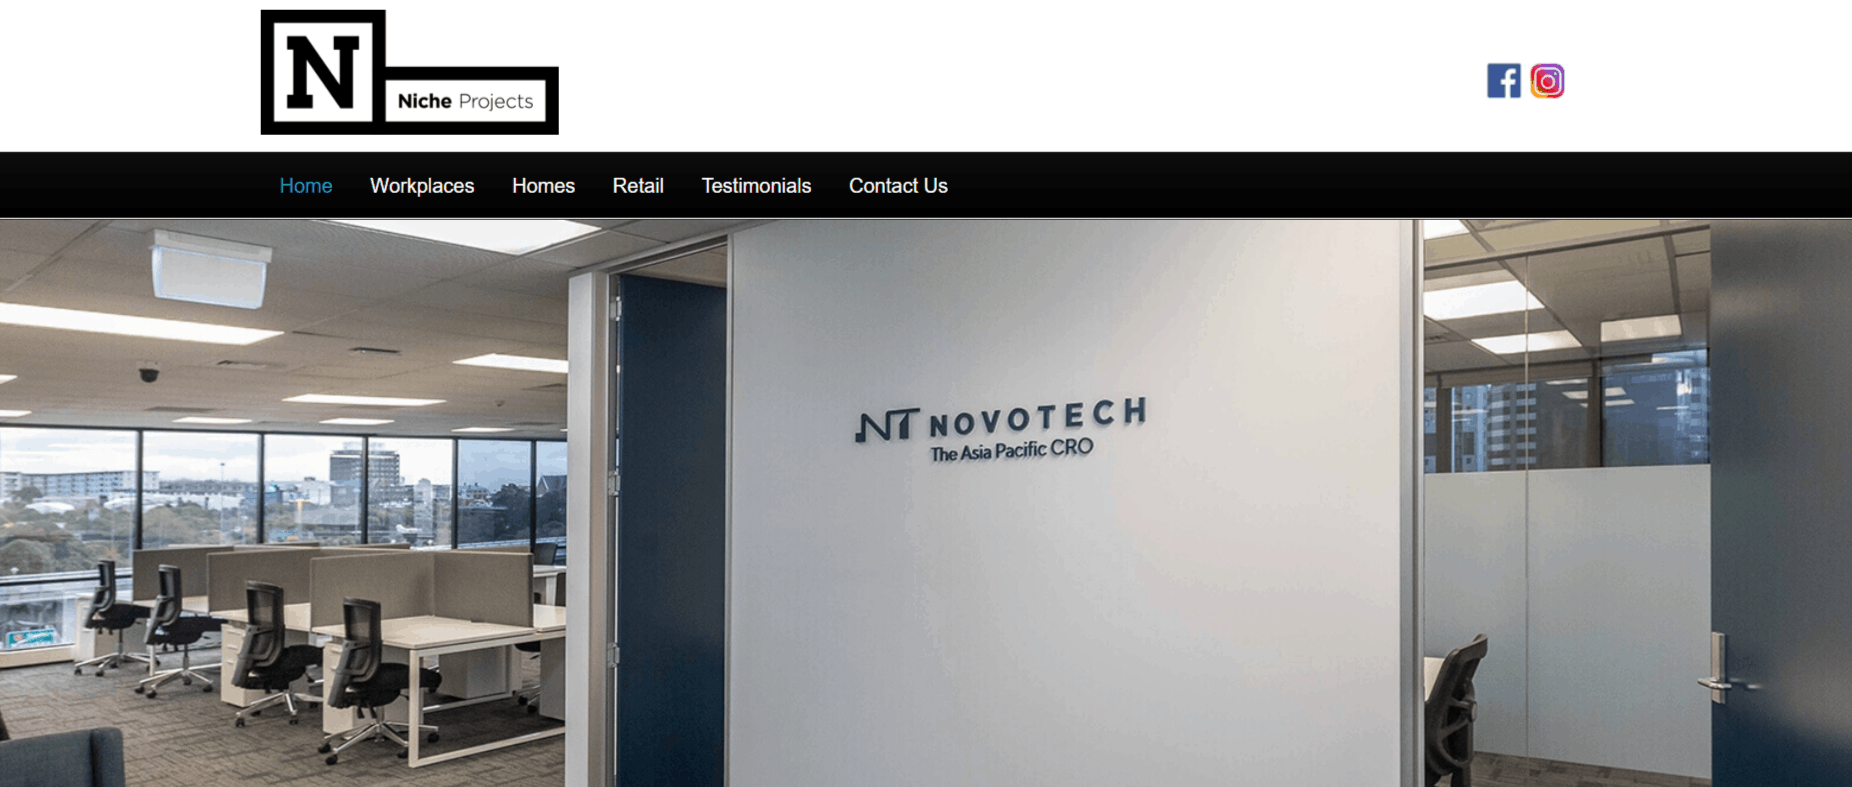 Niche Interior Projects